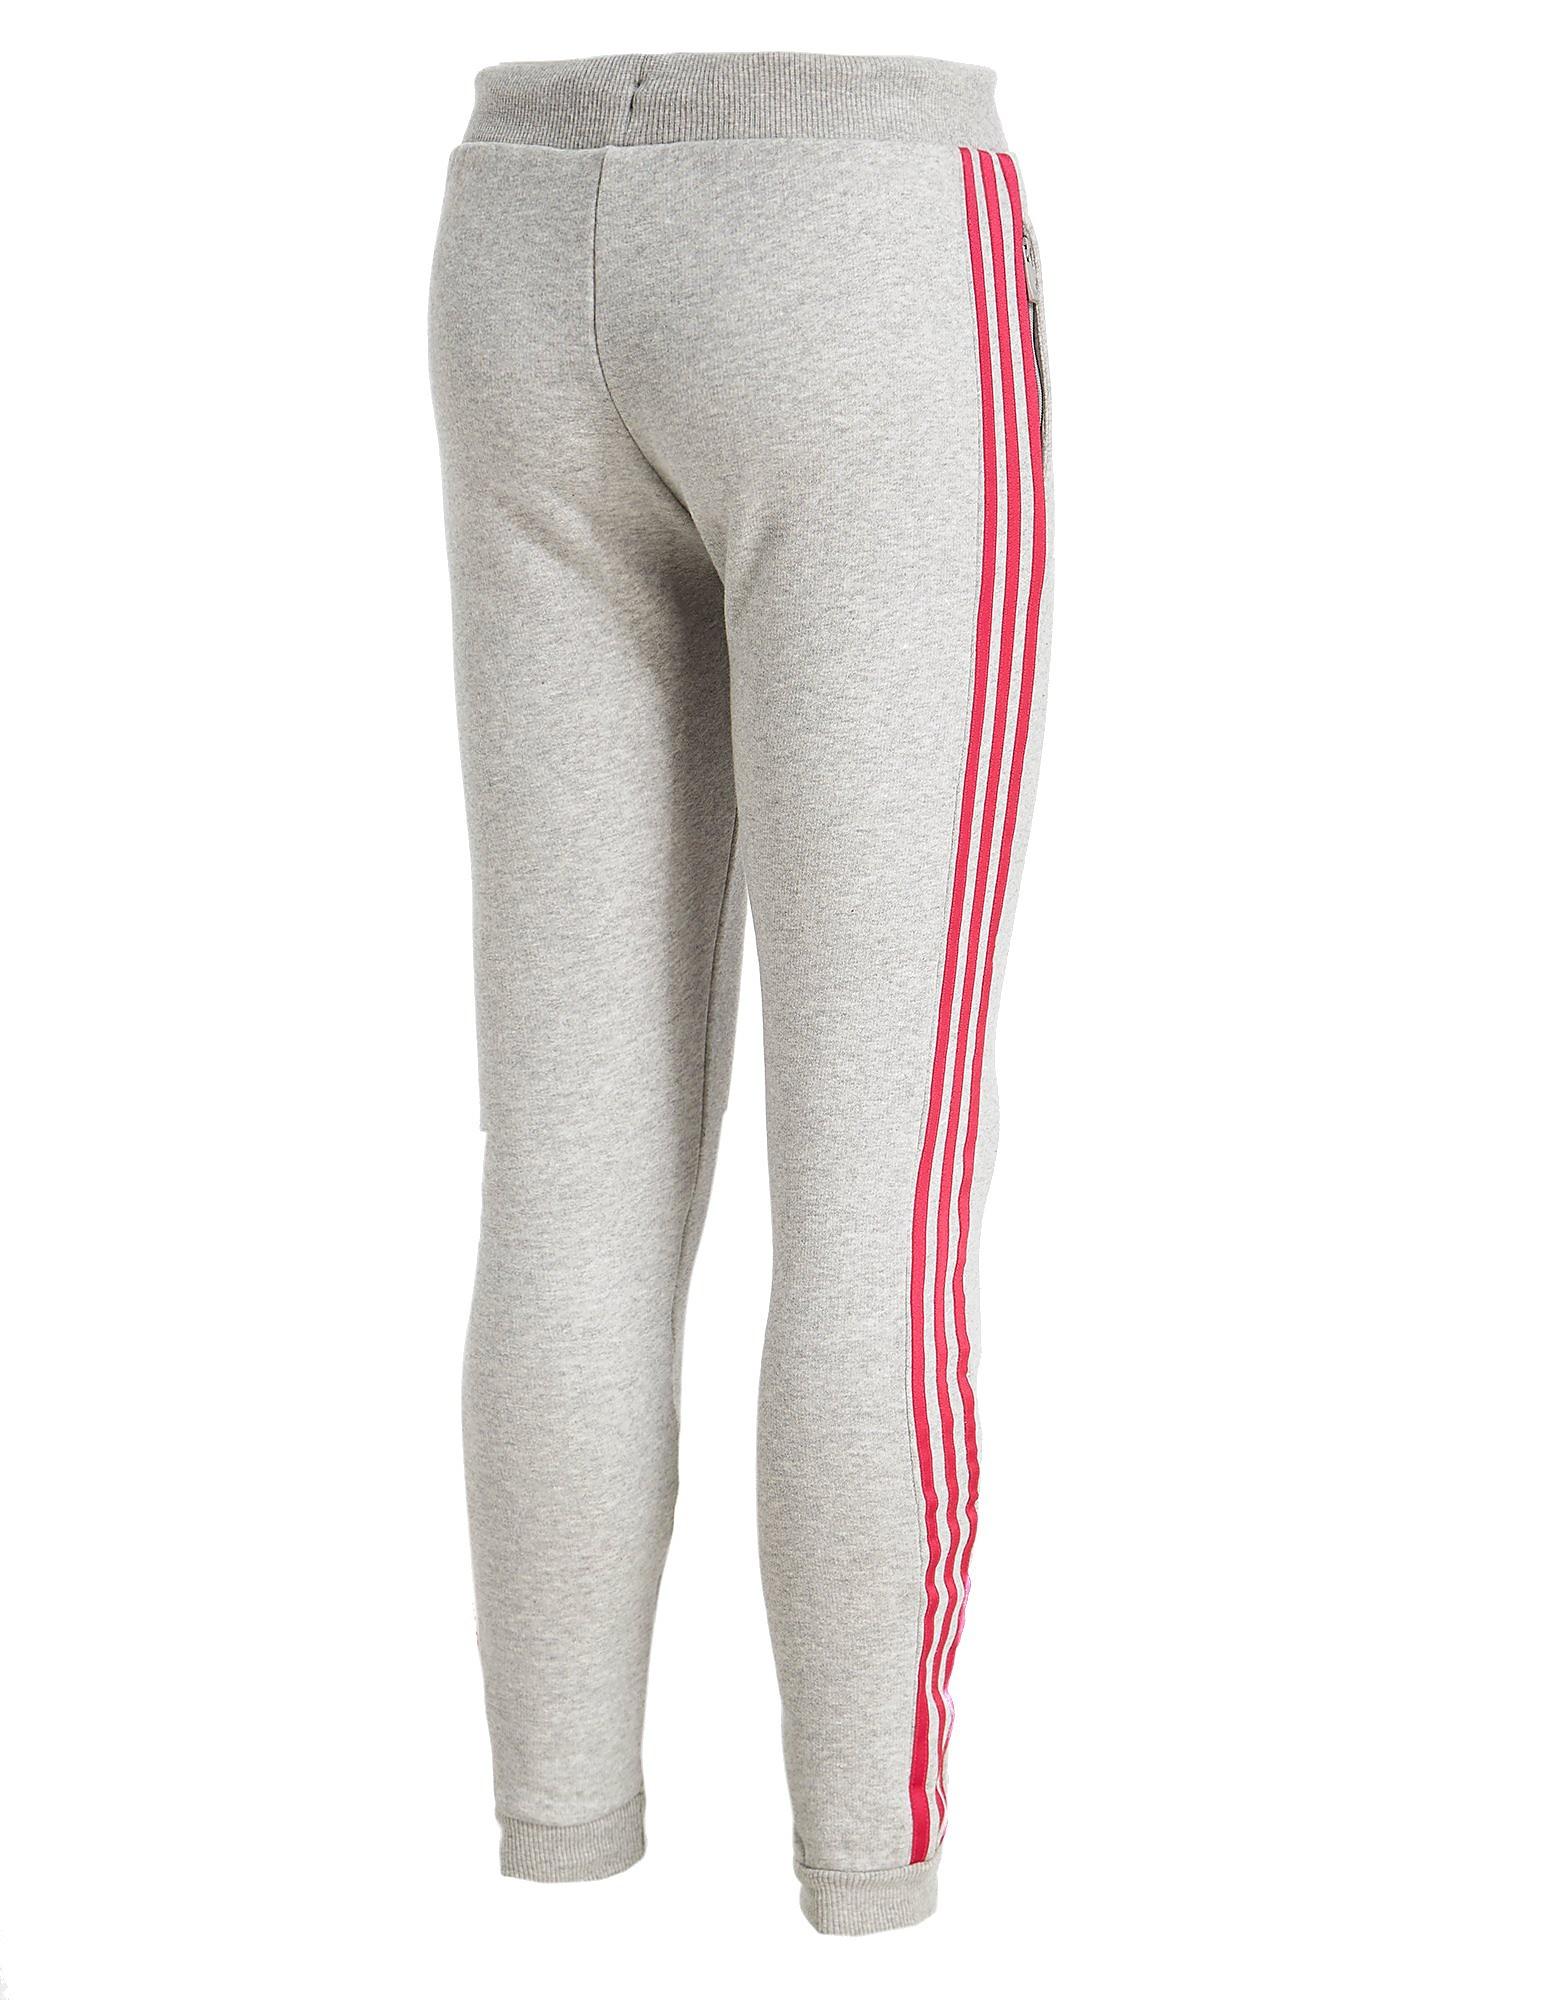 adidas Originals Girls' Slim Pants Junior